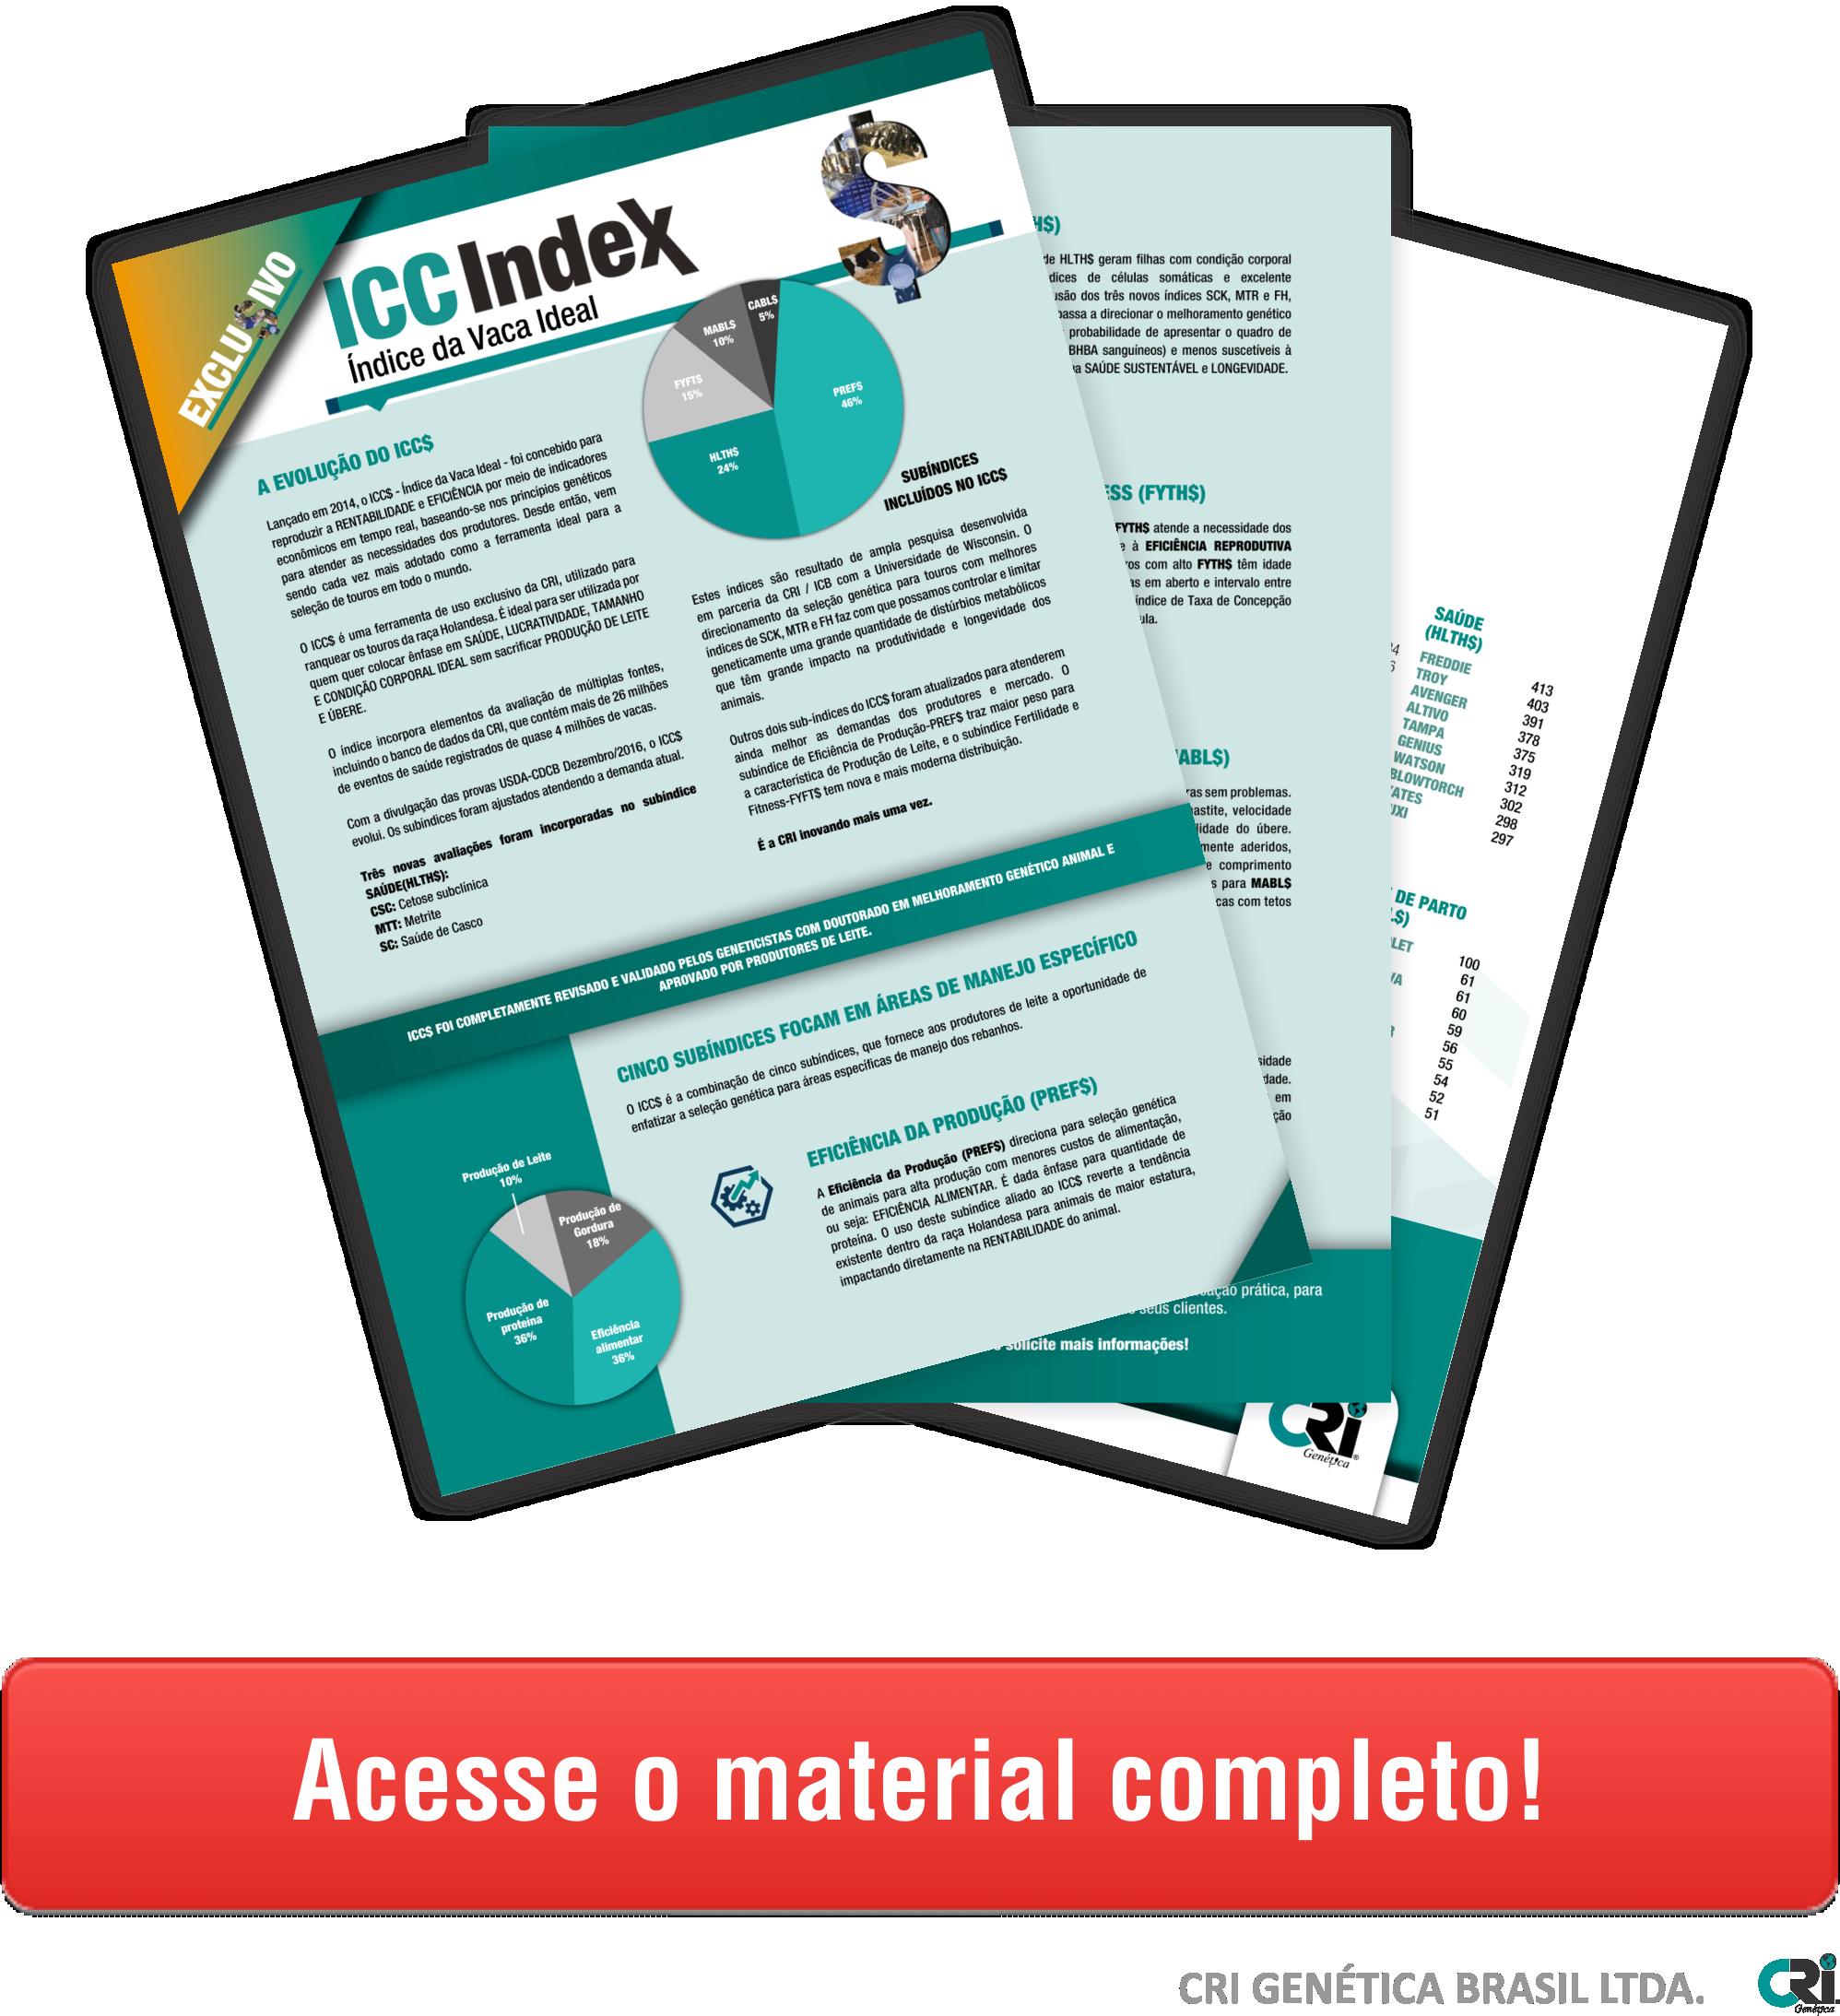 CTA folhetos explicativos ICC índice vaca ideal